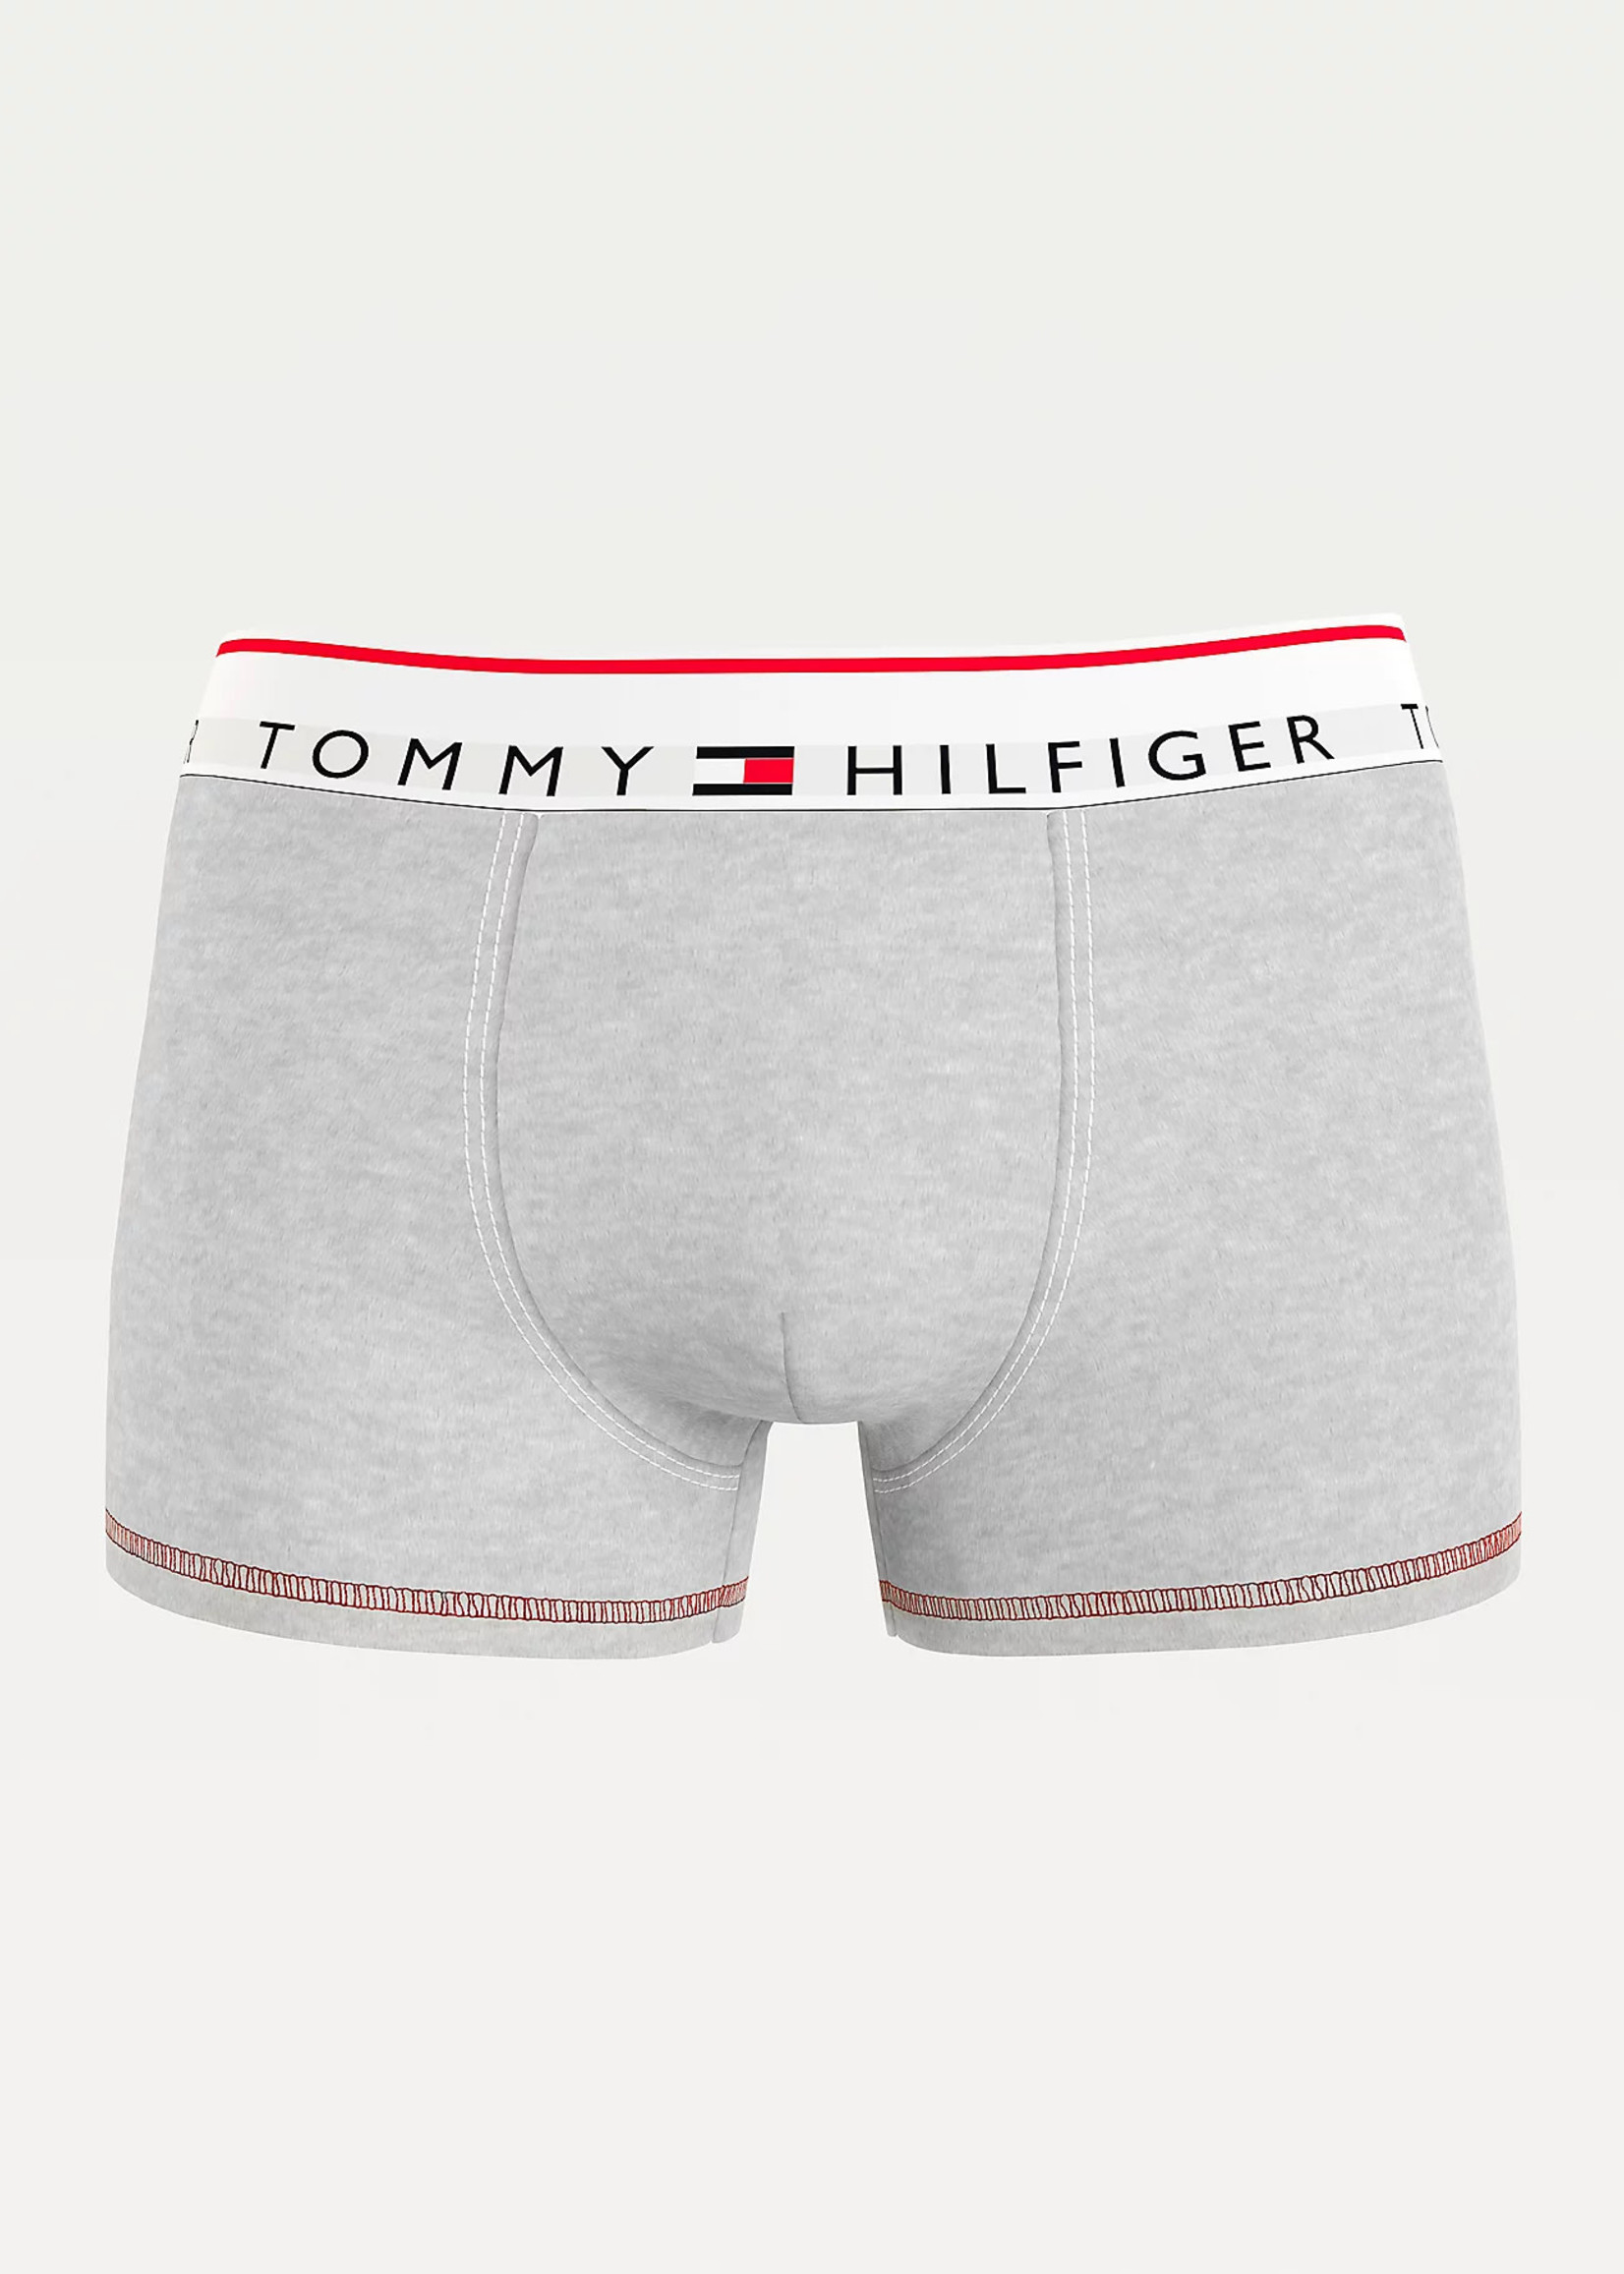 Tommy Hilfiger Logo Waistband Trunks | Grey | Tommy Hilfiger